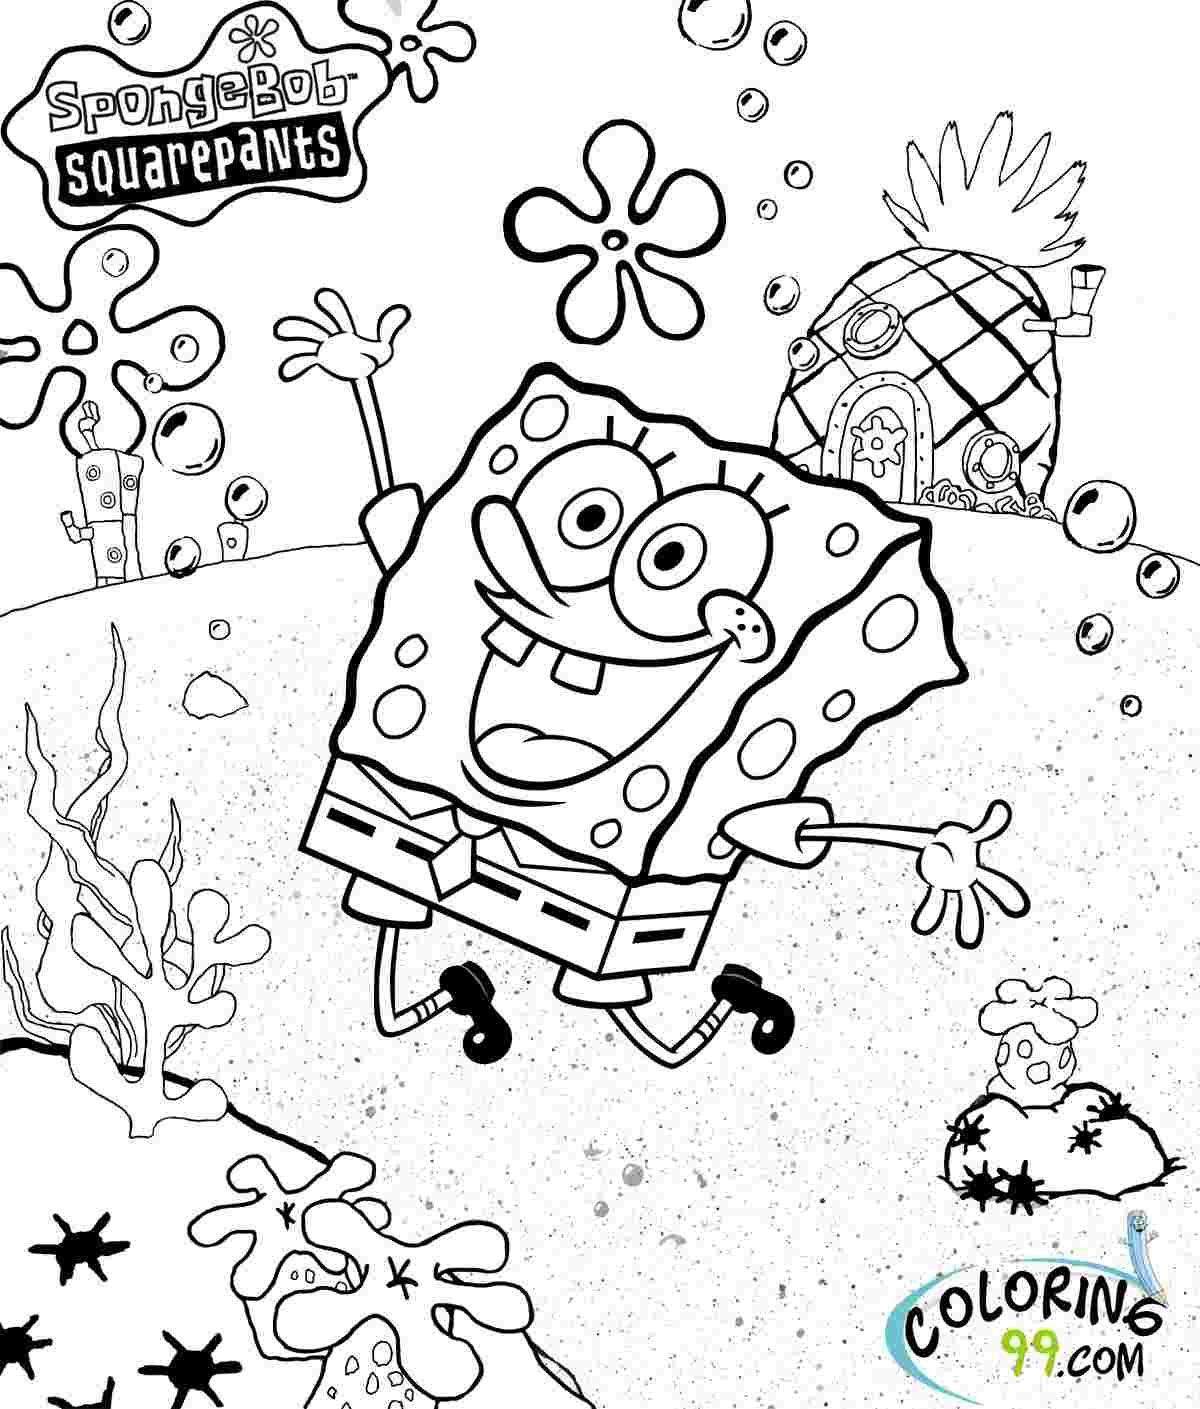 Spongebob Coloring Game Tag: 26 Staggering Spongebob Squarepants ...   1409x1200